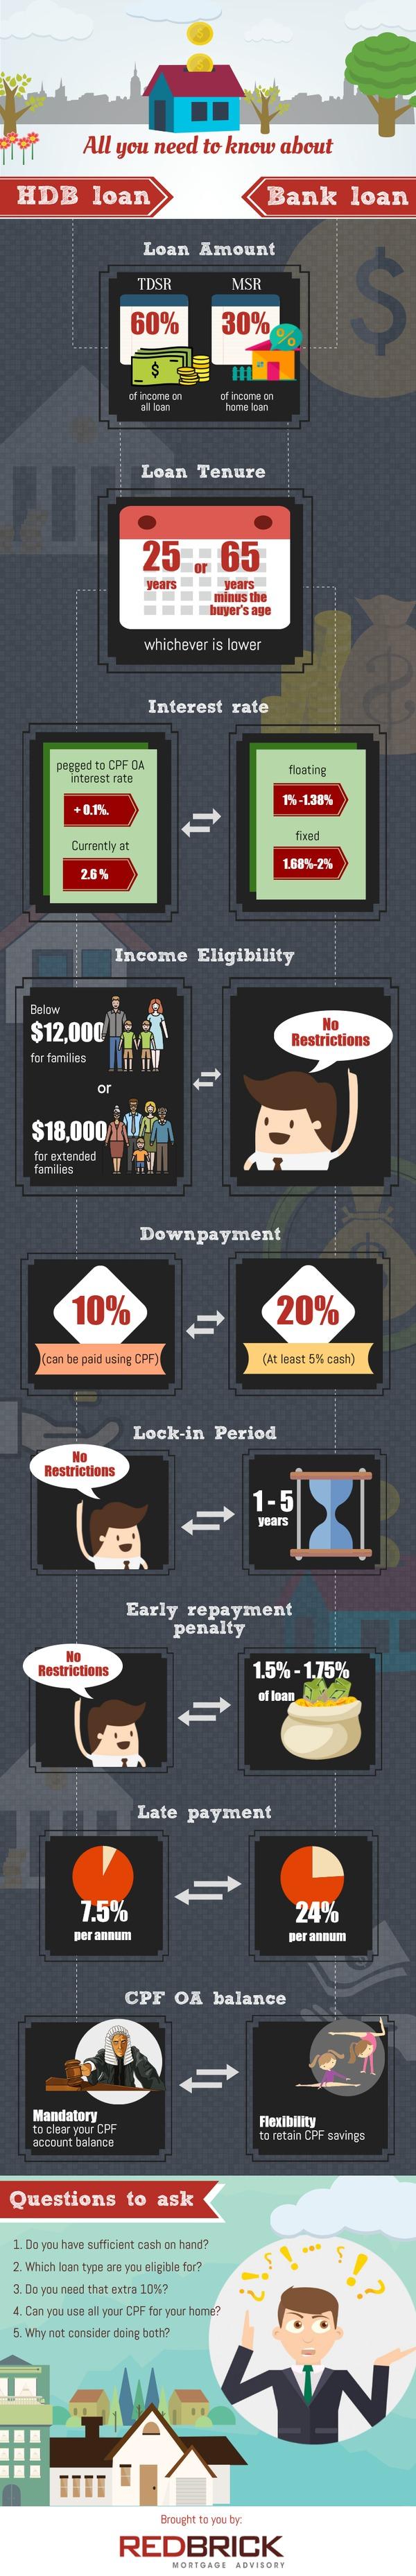 Should I get a HDB or Bank loan if I'm buying a HDB flat?